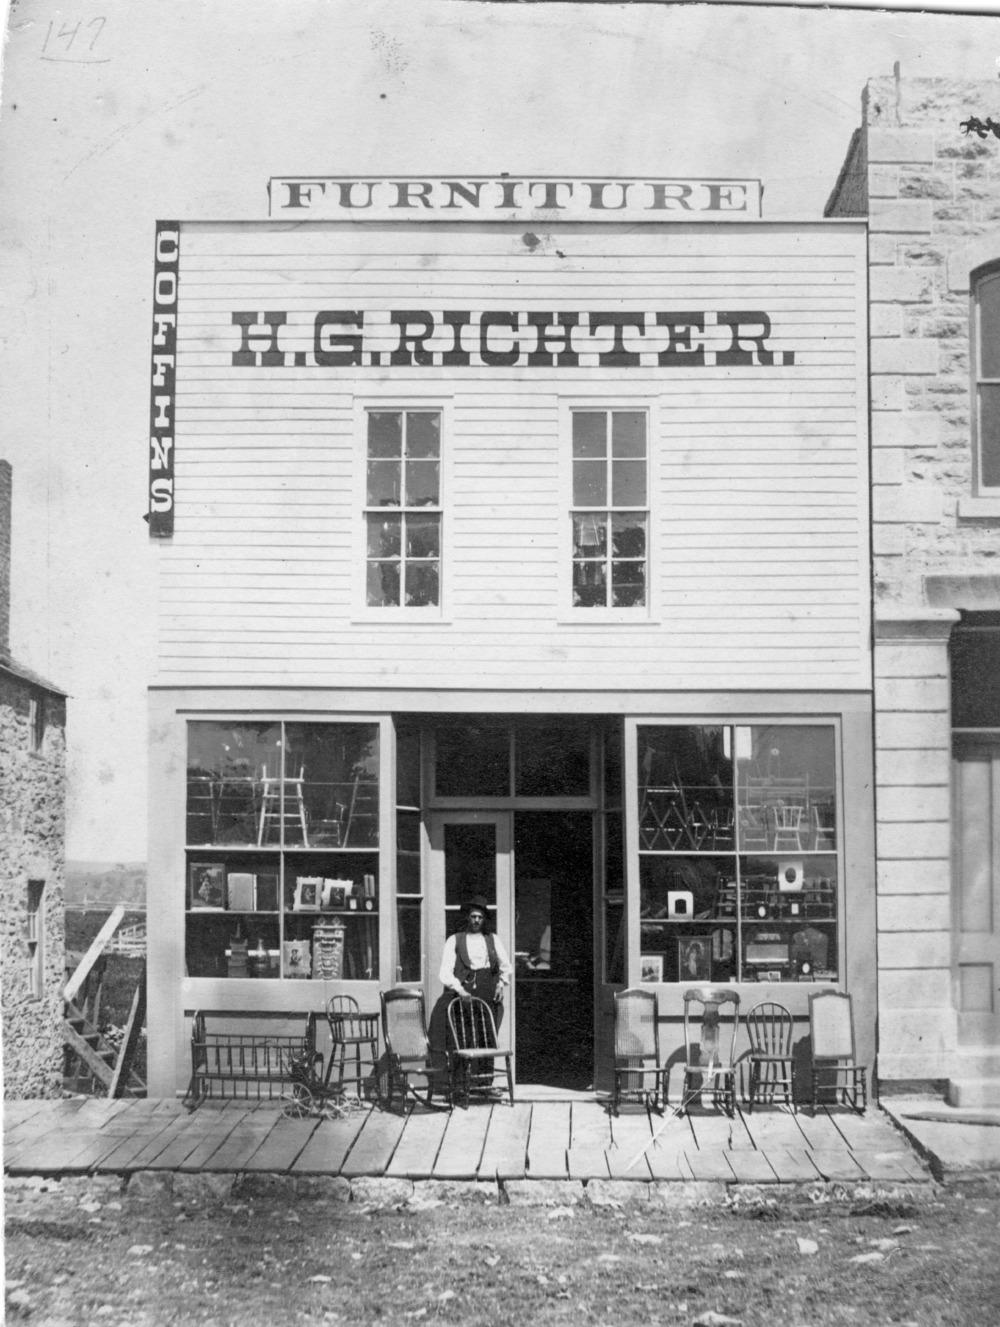 Charmant H. G. Richter Furniture Store, Alma, Kansas